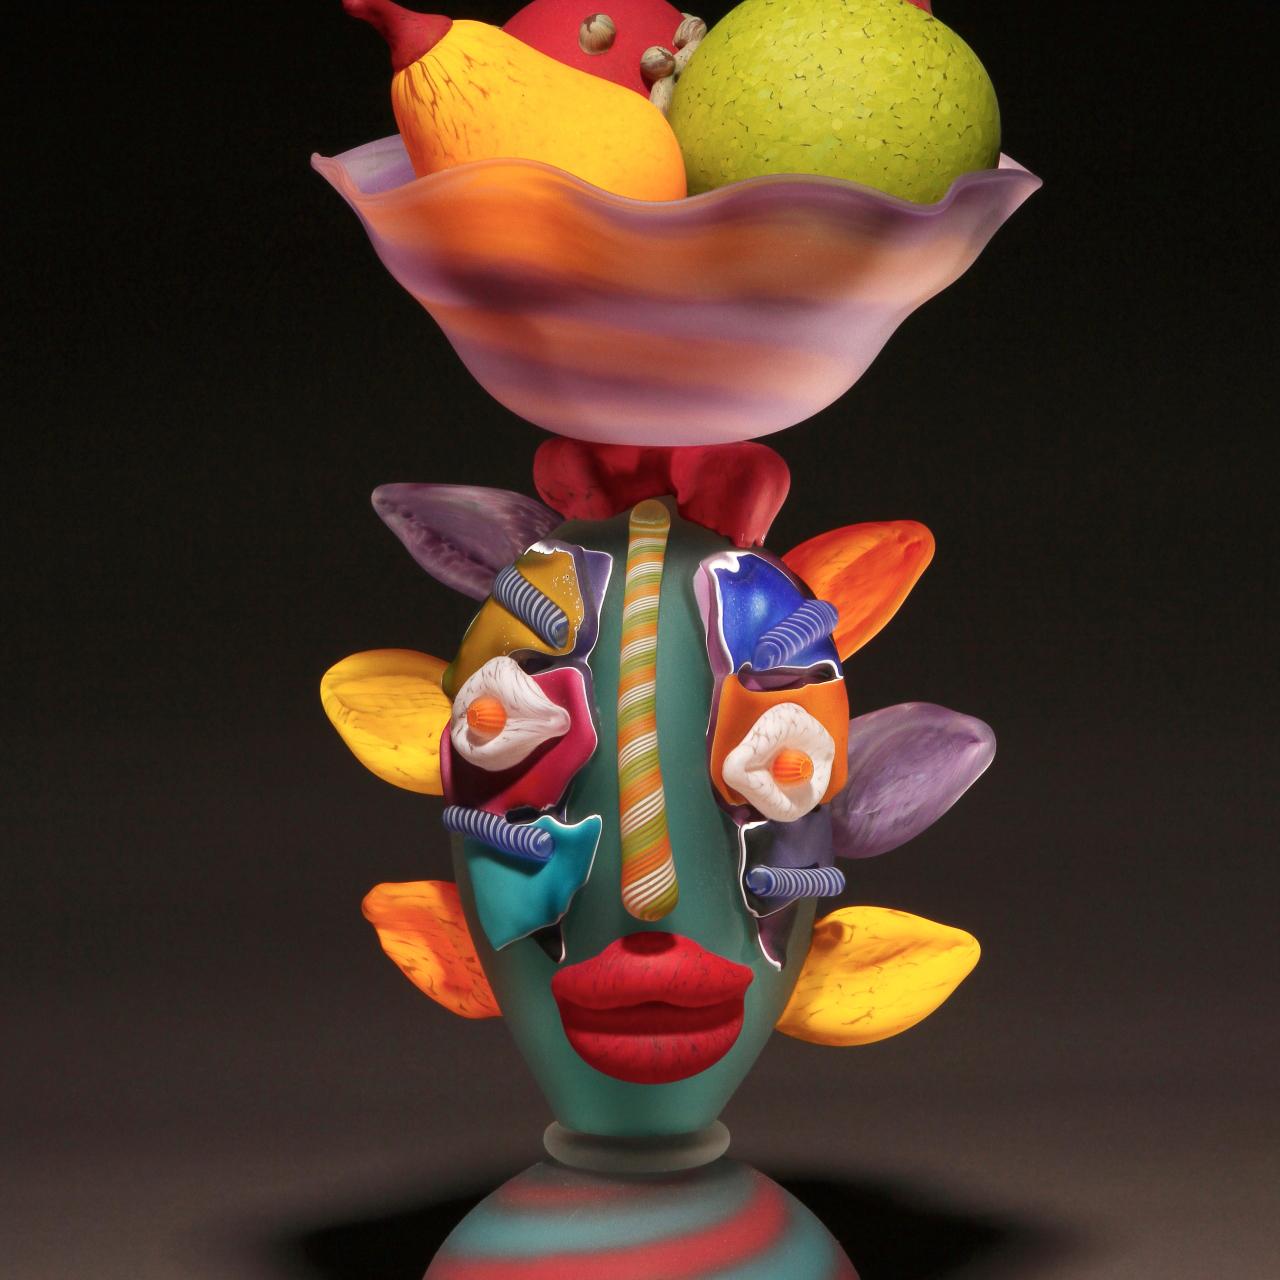 Woman_With_Fruit_Basket_-_James_Wilbat_19x9x9